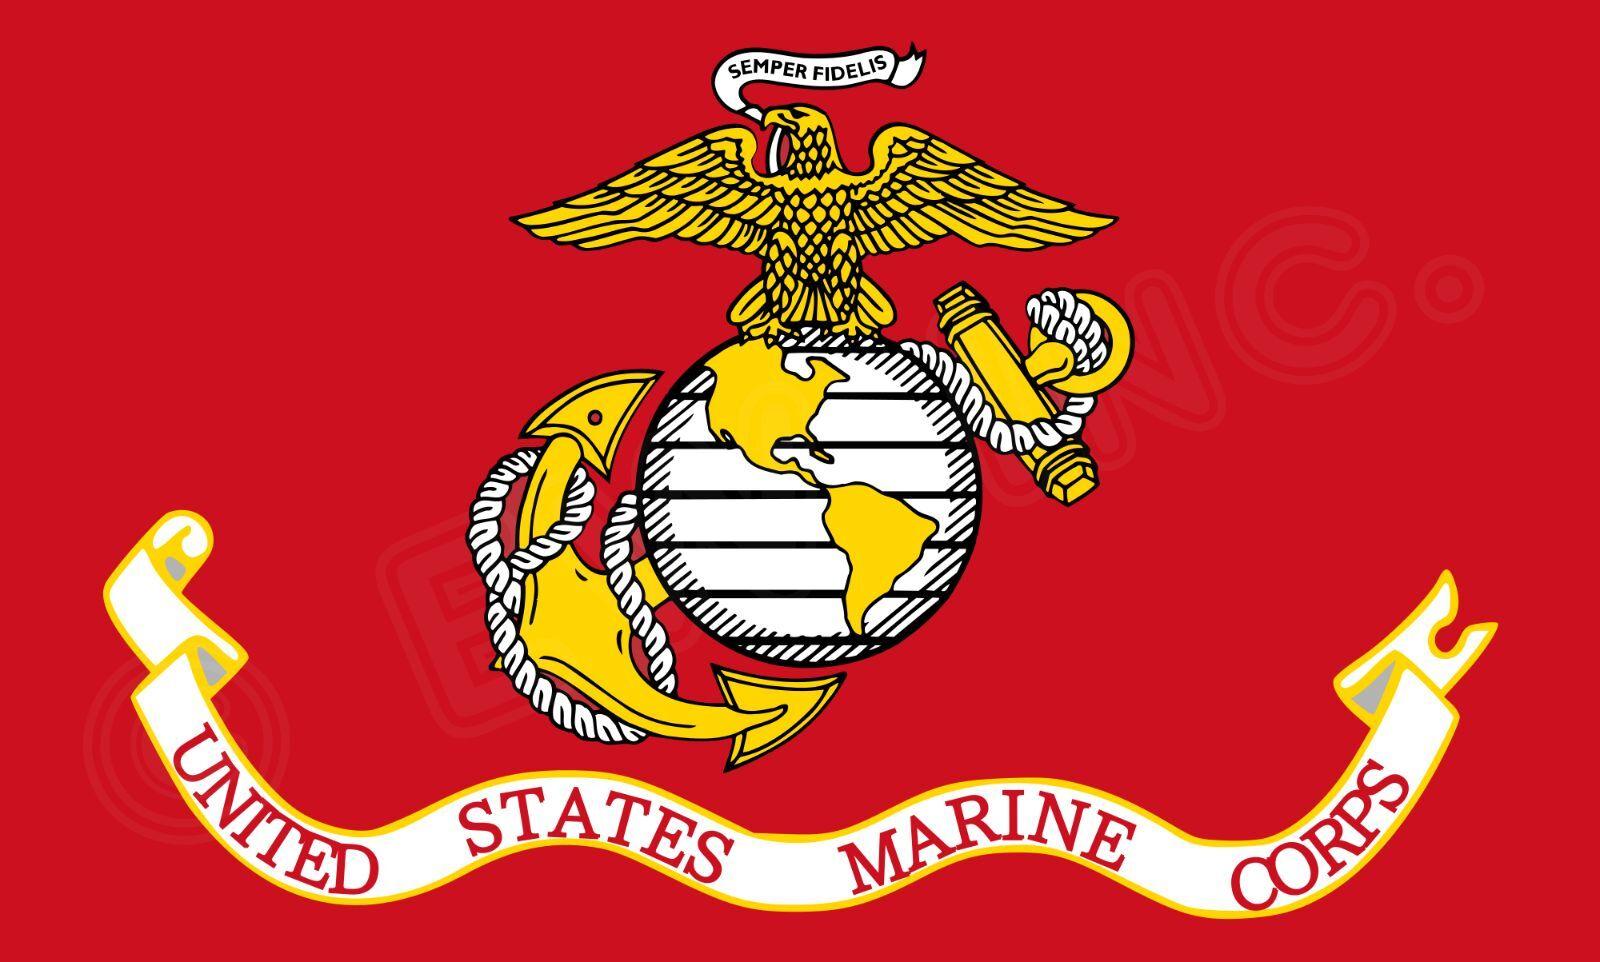 USMC UNITED STATE MARINE CORPS FLAG 3 X 5 SEMPER FI FIDELIS